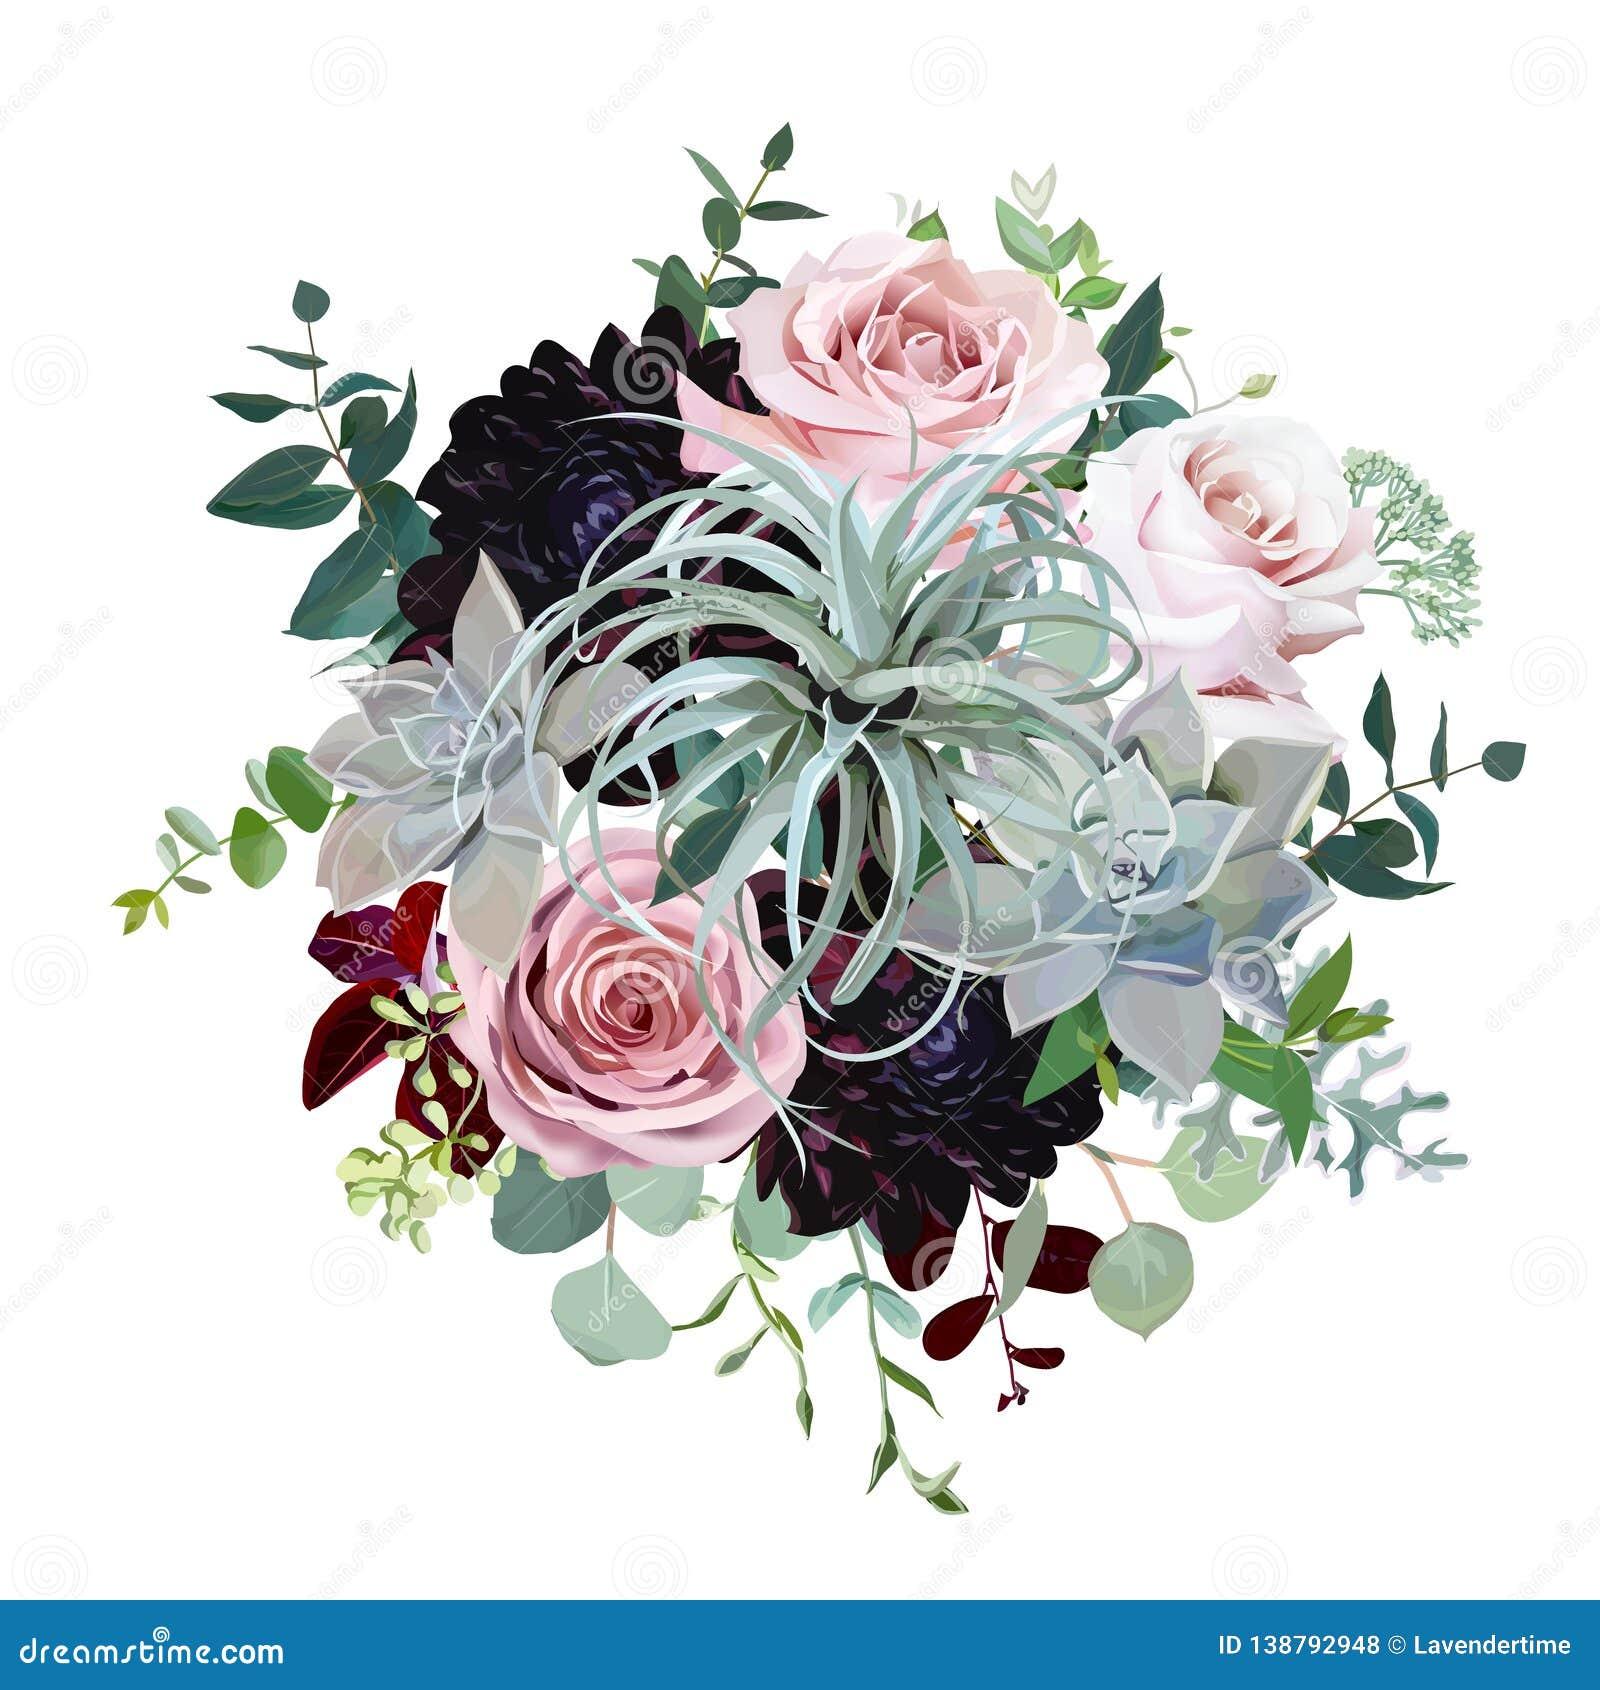 Dark Burgundy Dahlia Tillandsia Succulent Pale Roses Eucalyptus Greenery Stock Vector Illustration Of Boho Burgundy 138792948